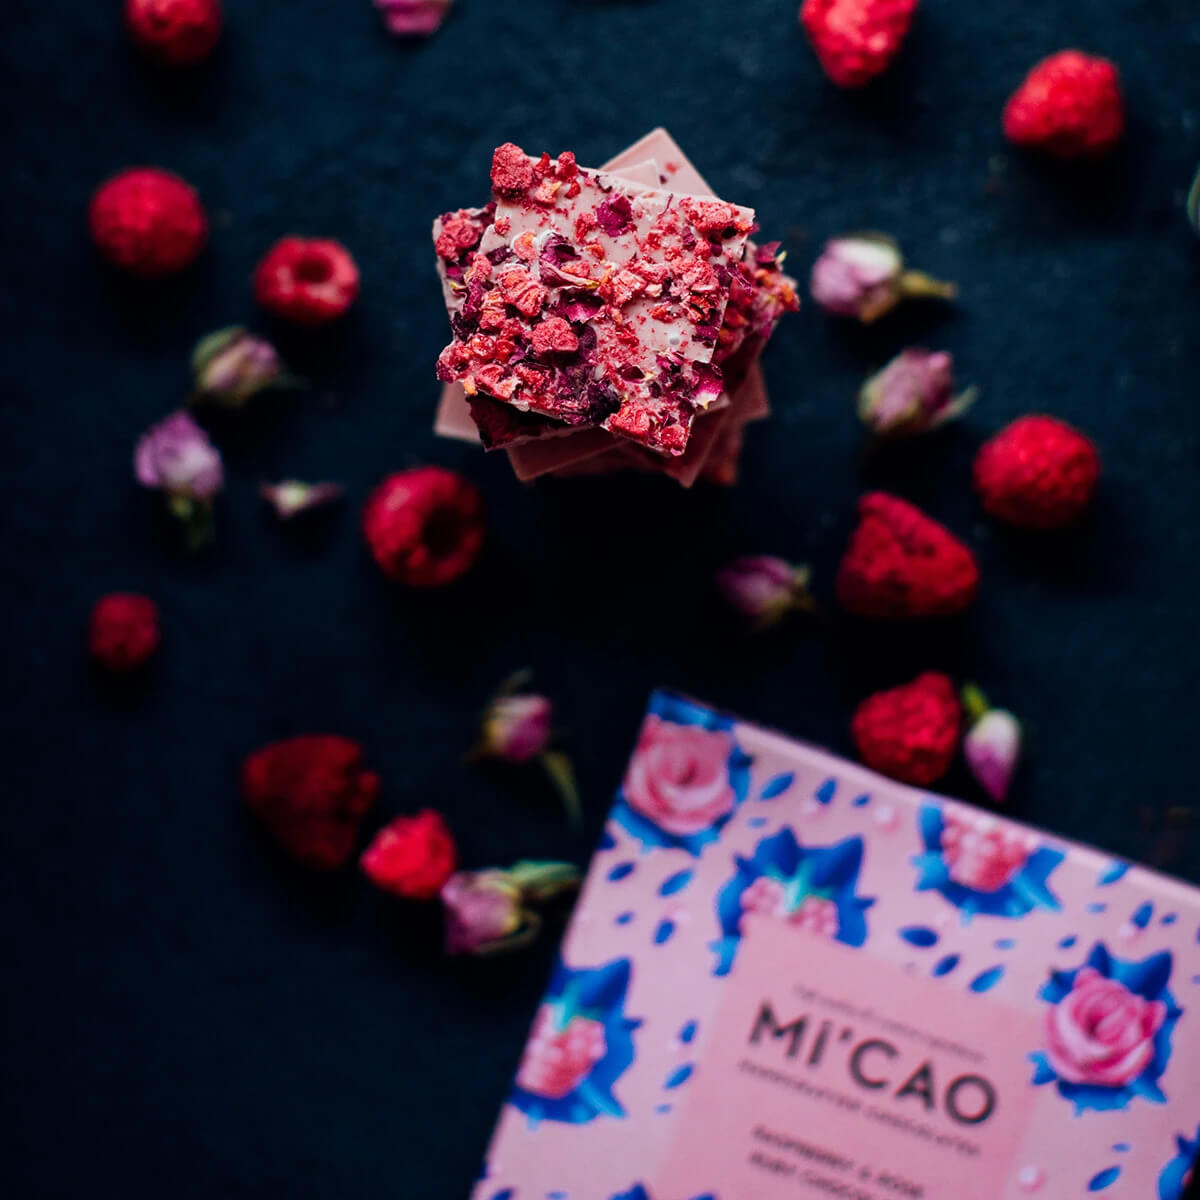 MI'Cao Gül Kurusu & Ahududu Ruby Çikolata Tablet 70GR